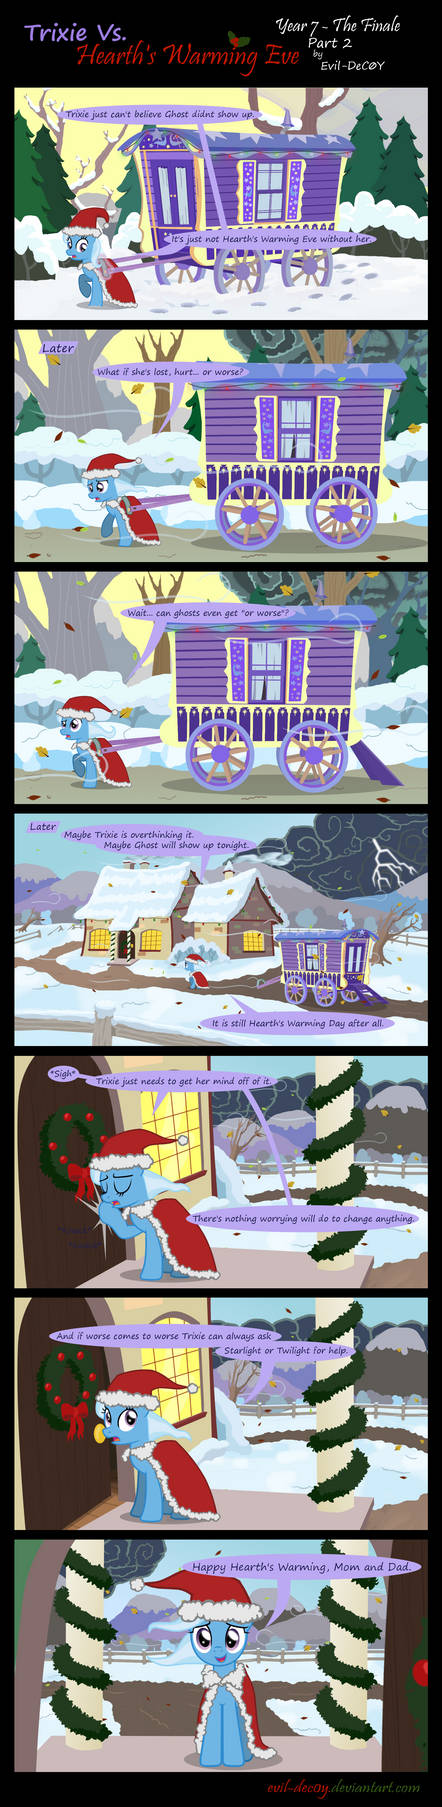 Trixie Vs. Hearth's Warming Eve: Finale (Part 2)